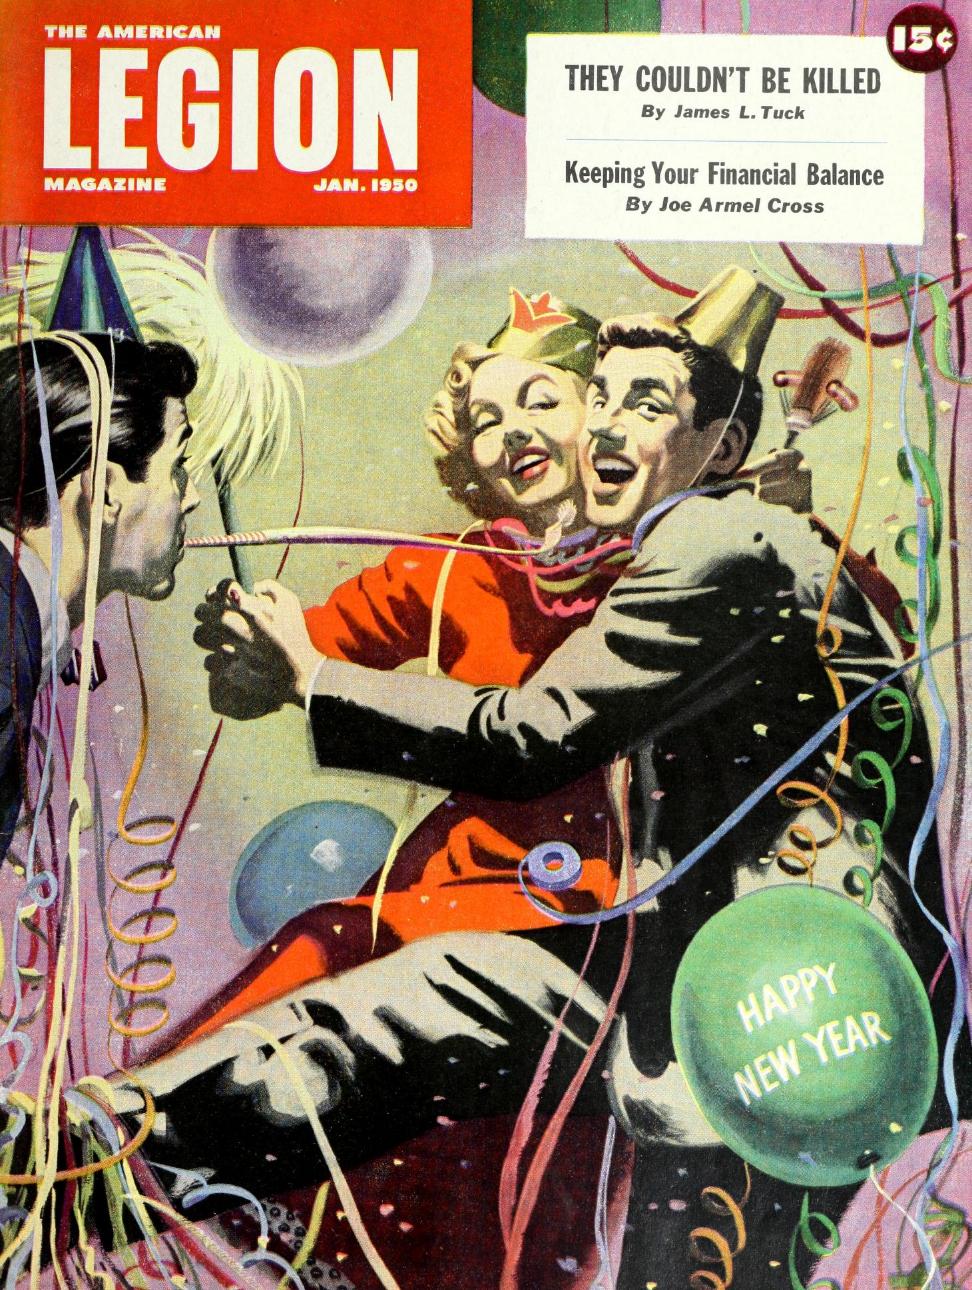 The American Legion Magazine - January 1950